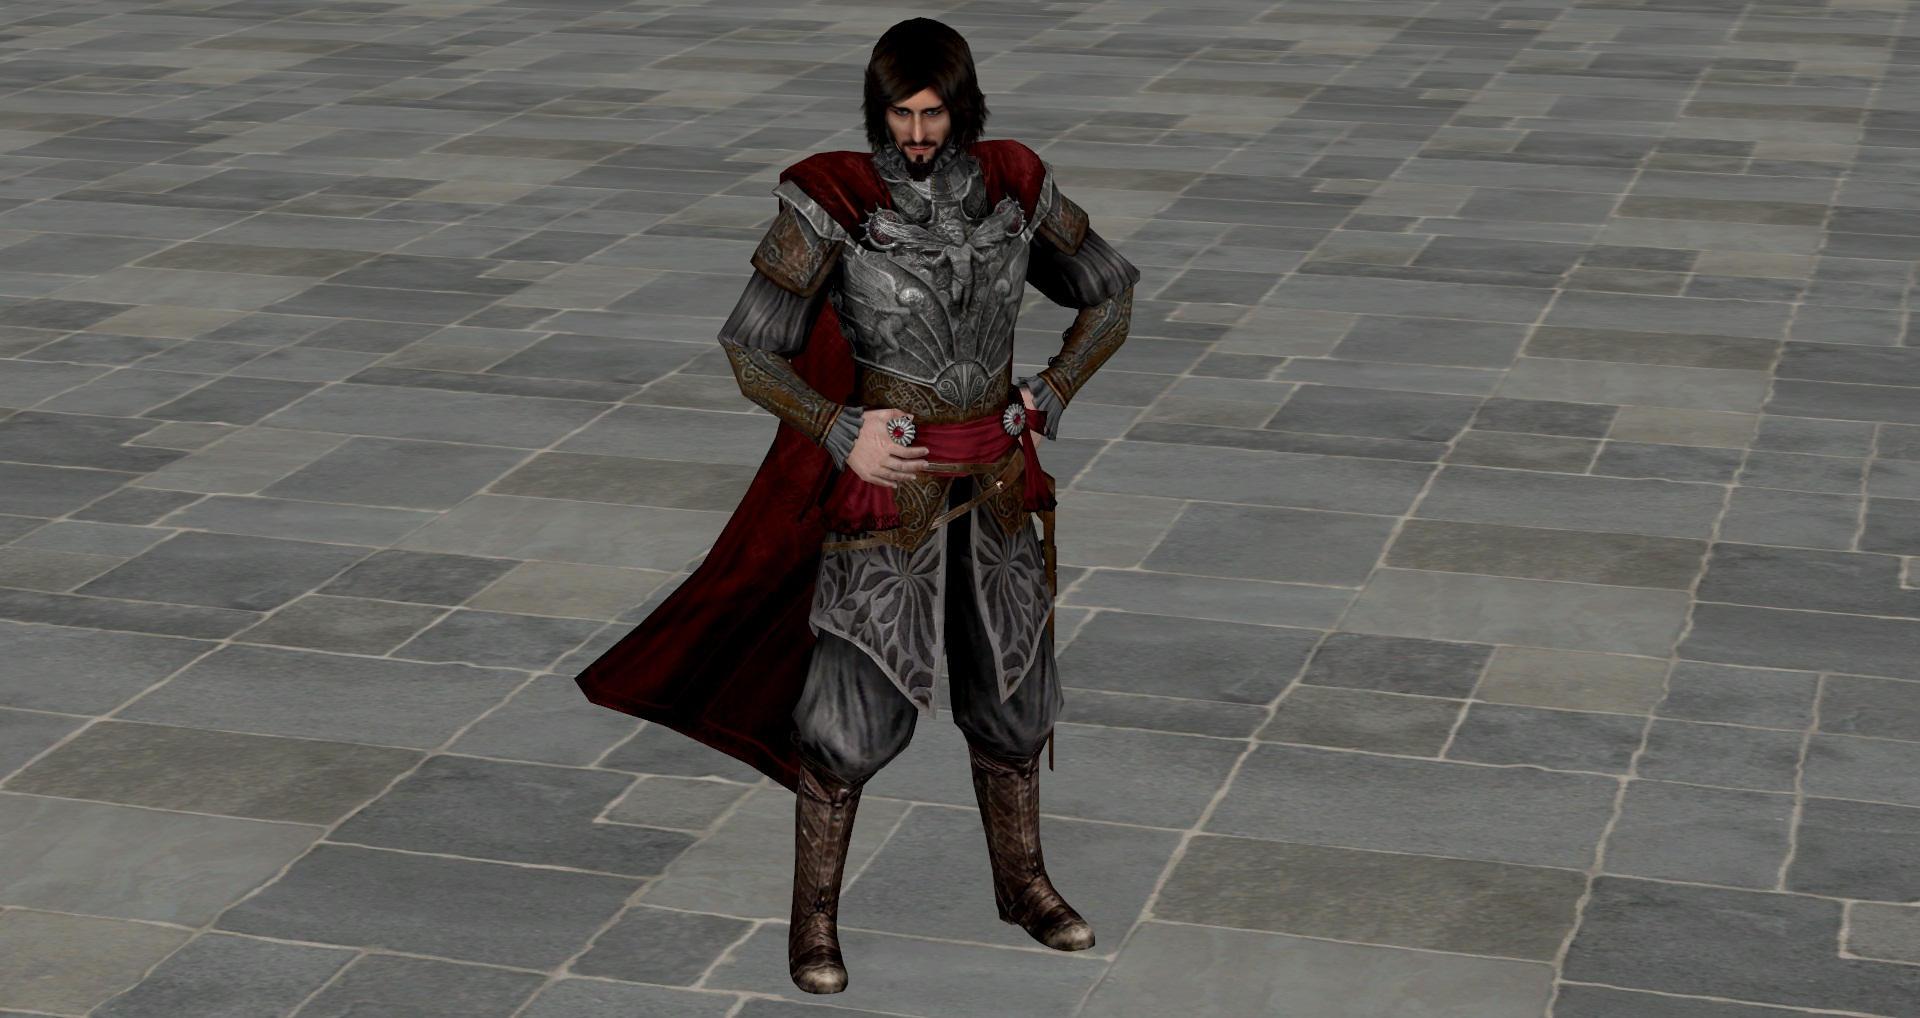 Cesare Borgia model by milance941